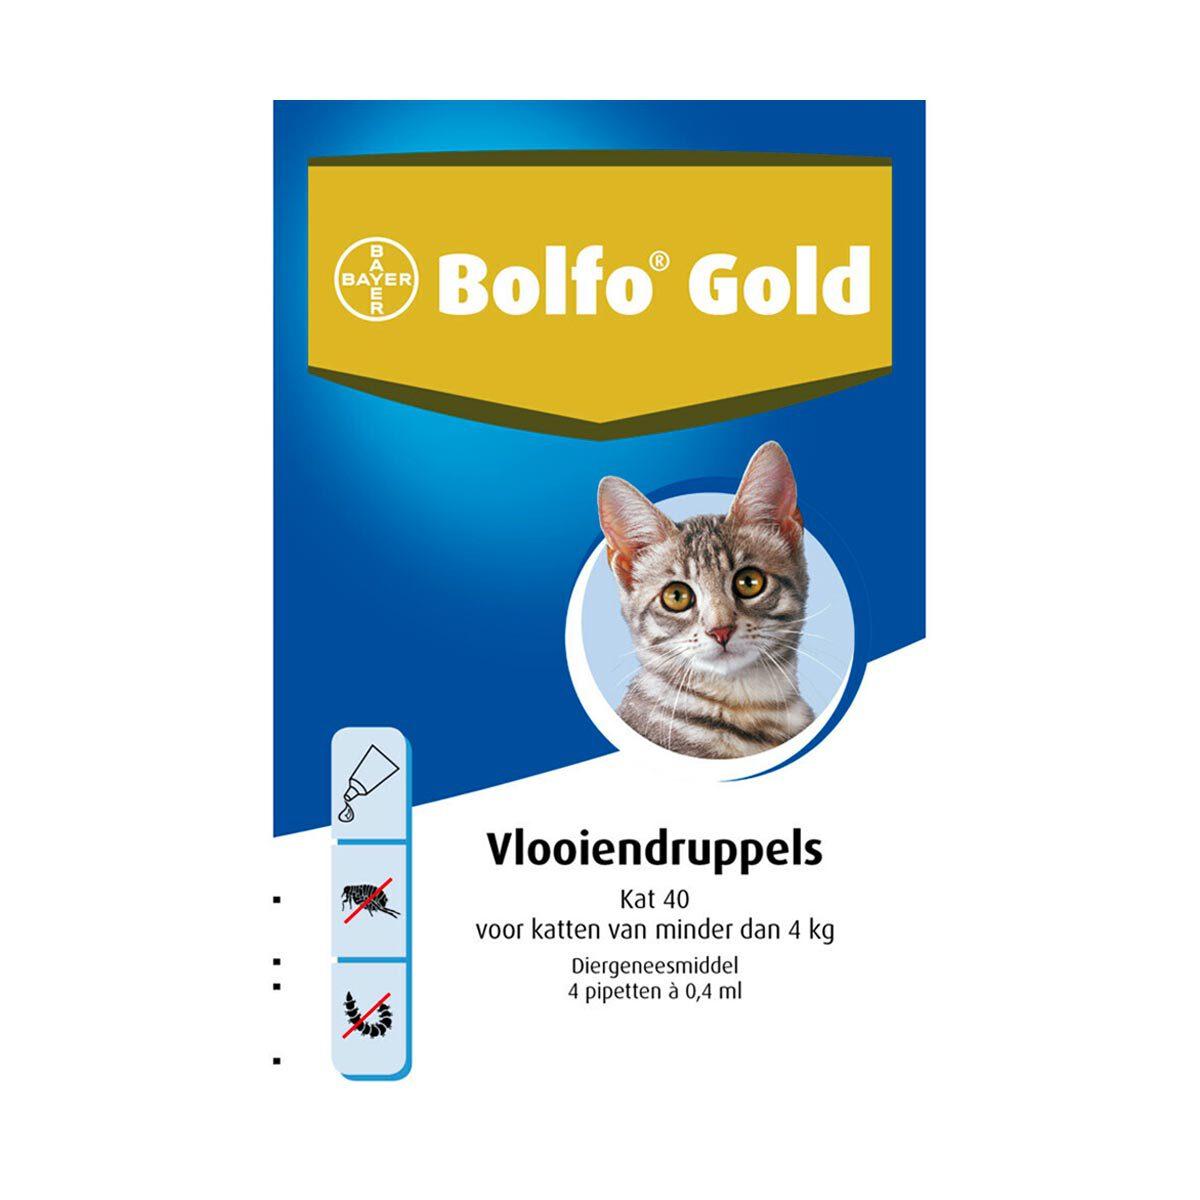 Bolfo Gold Kat 40 Vlooiendruppels van 0-4 kg 4 pipetten